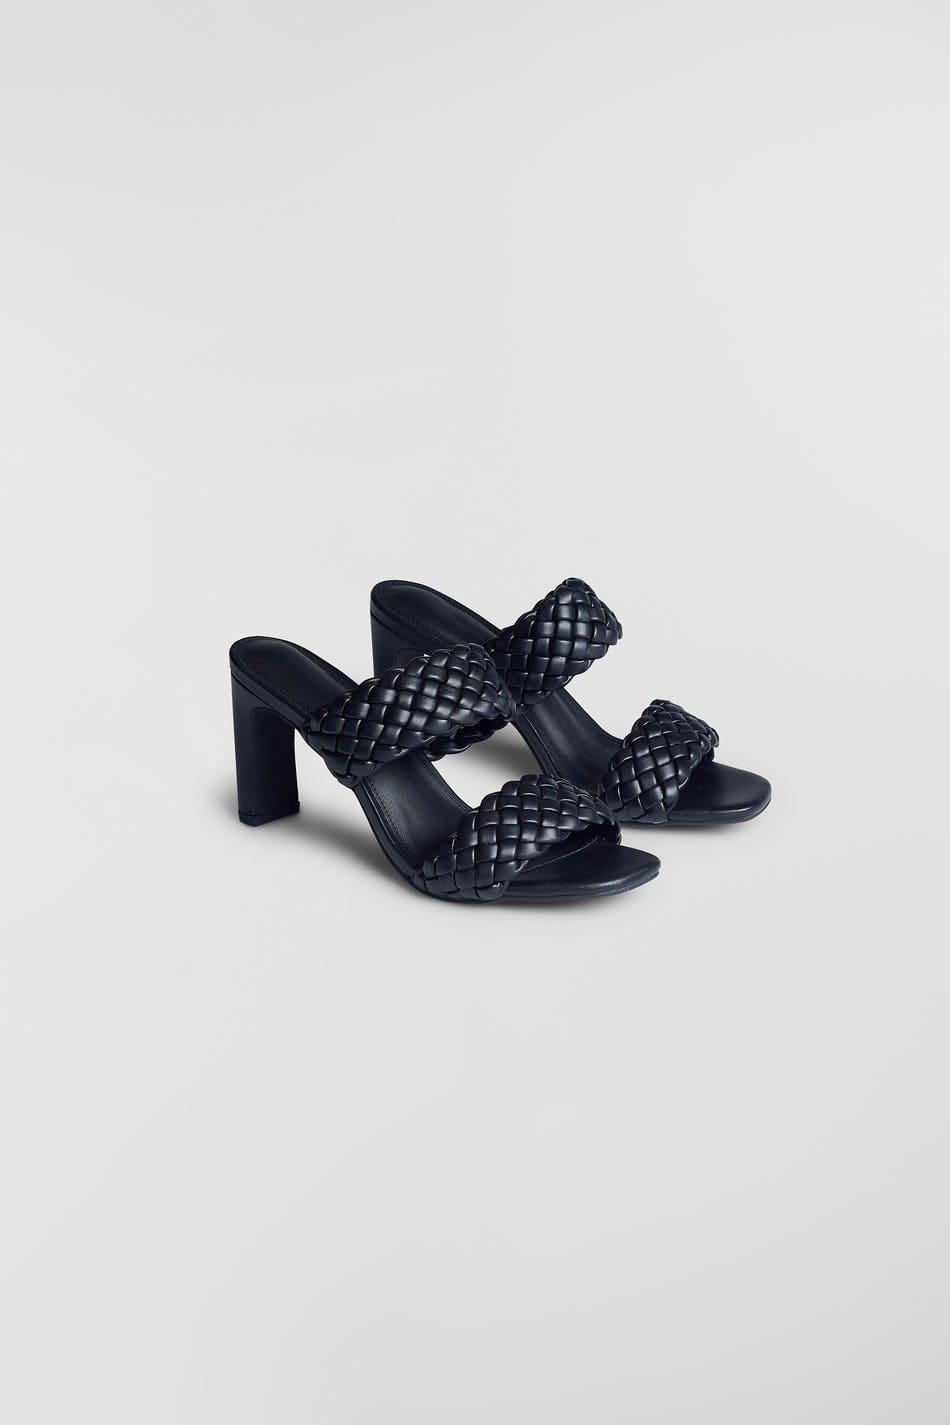 Högklackade sandaler med en slip-on design 2021